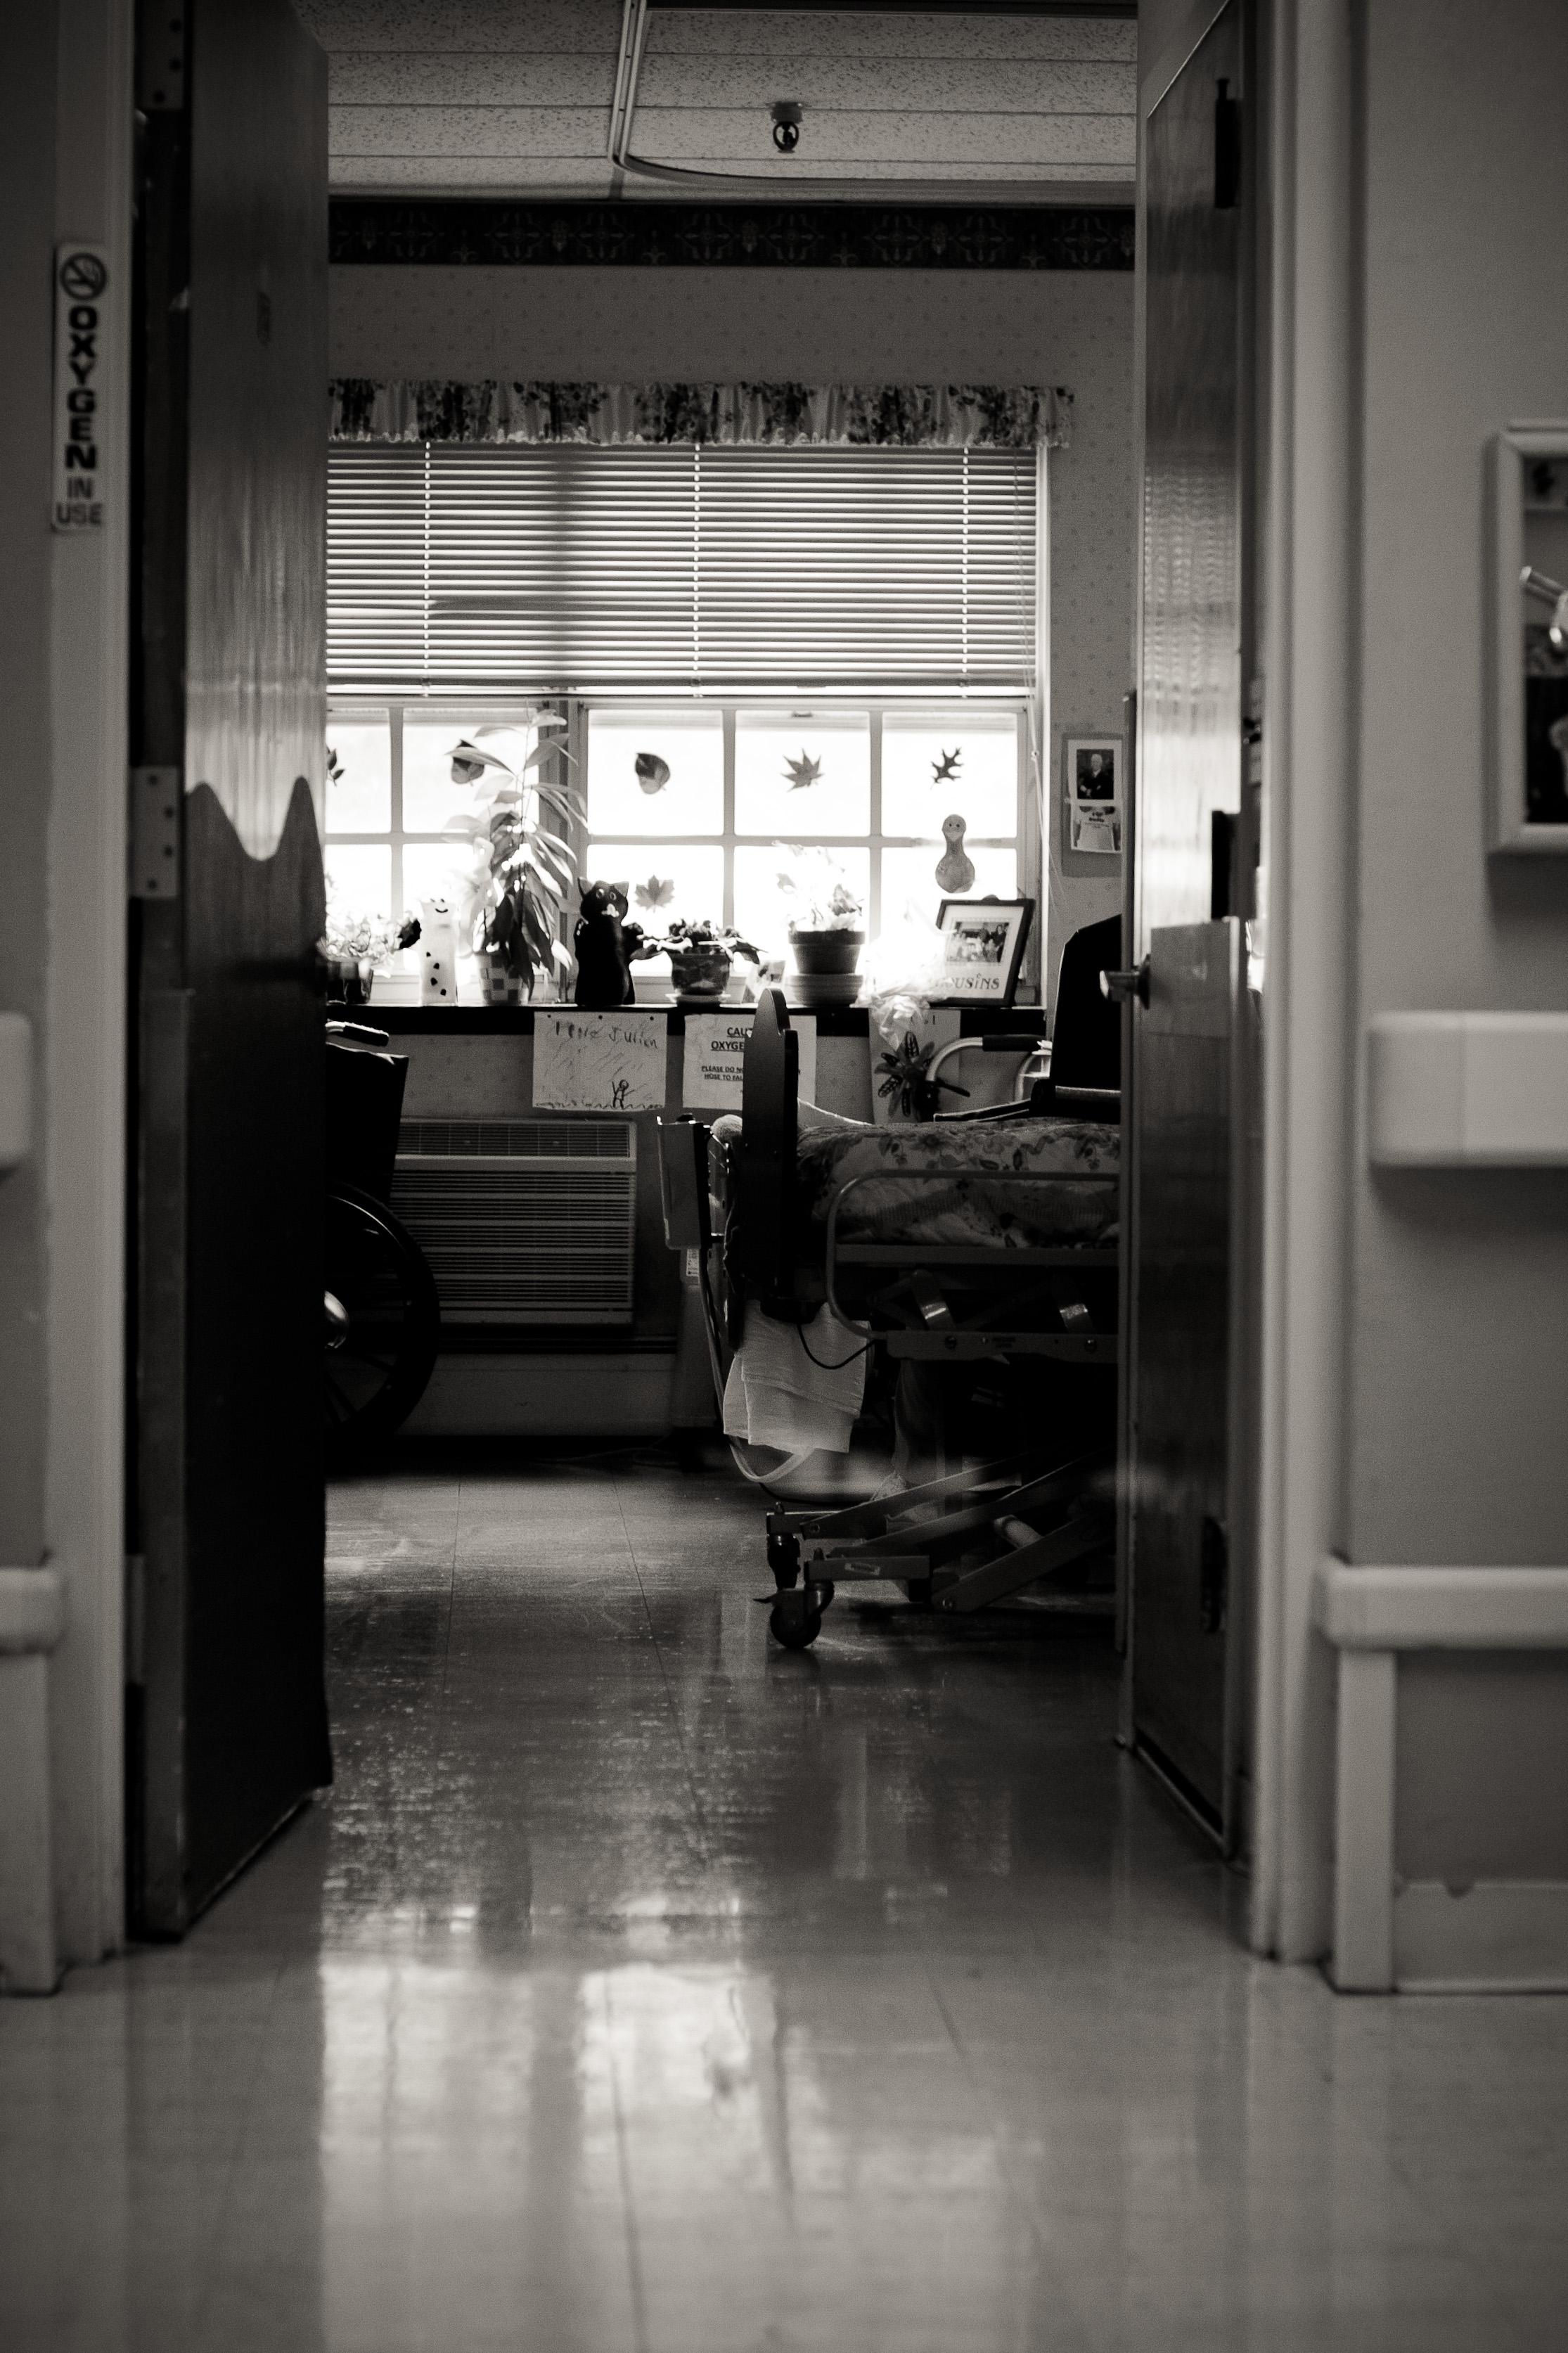 286:366, across the hallway